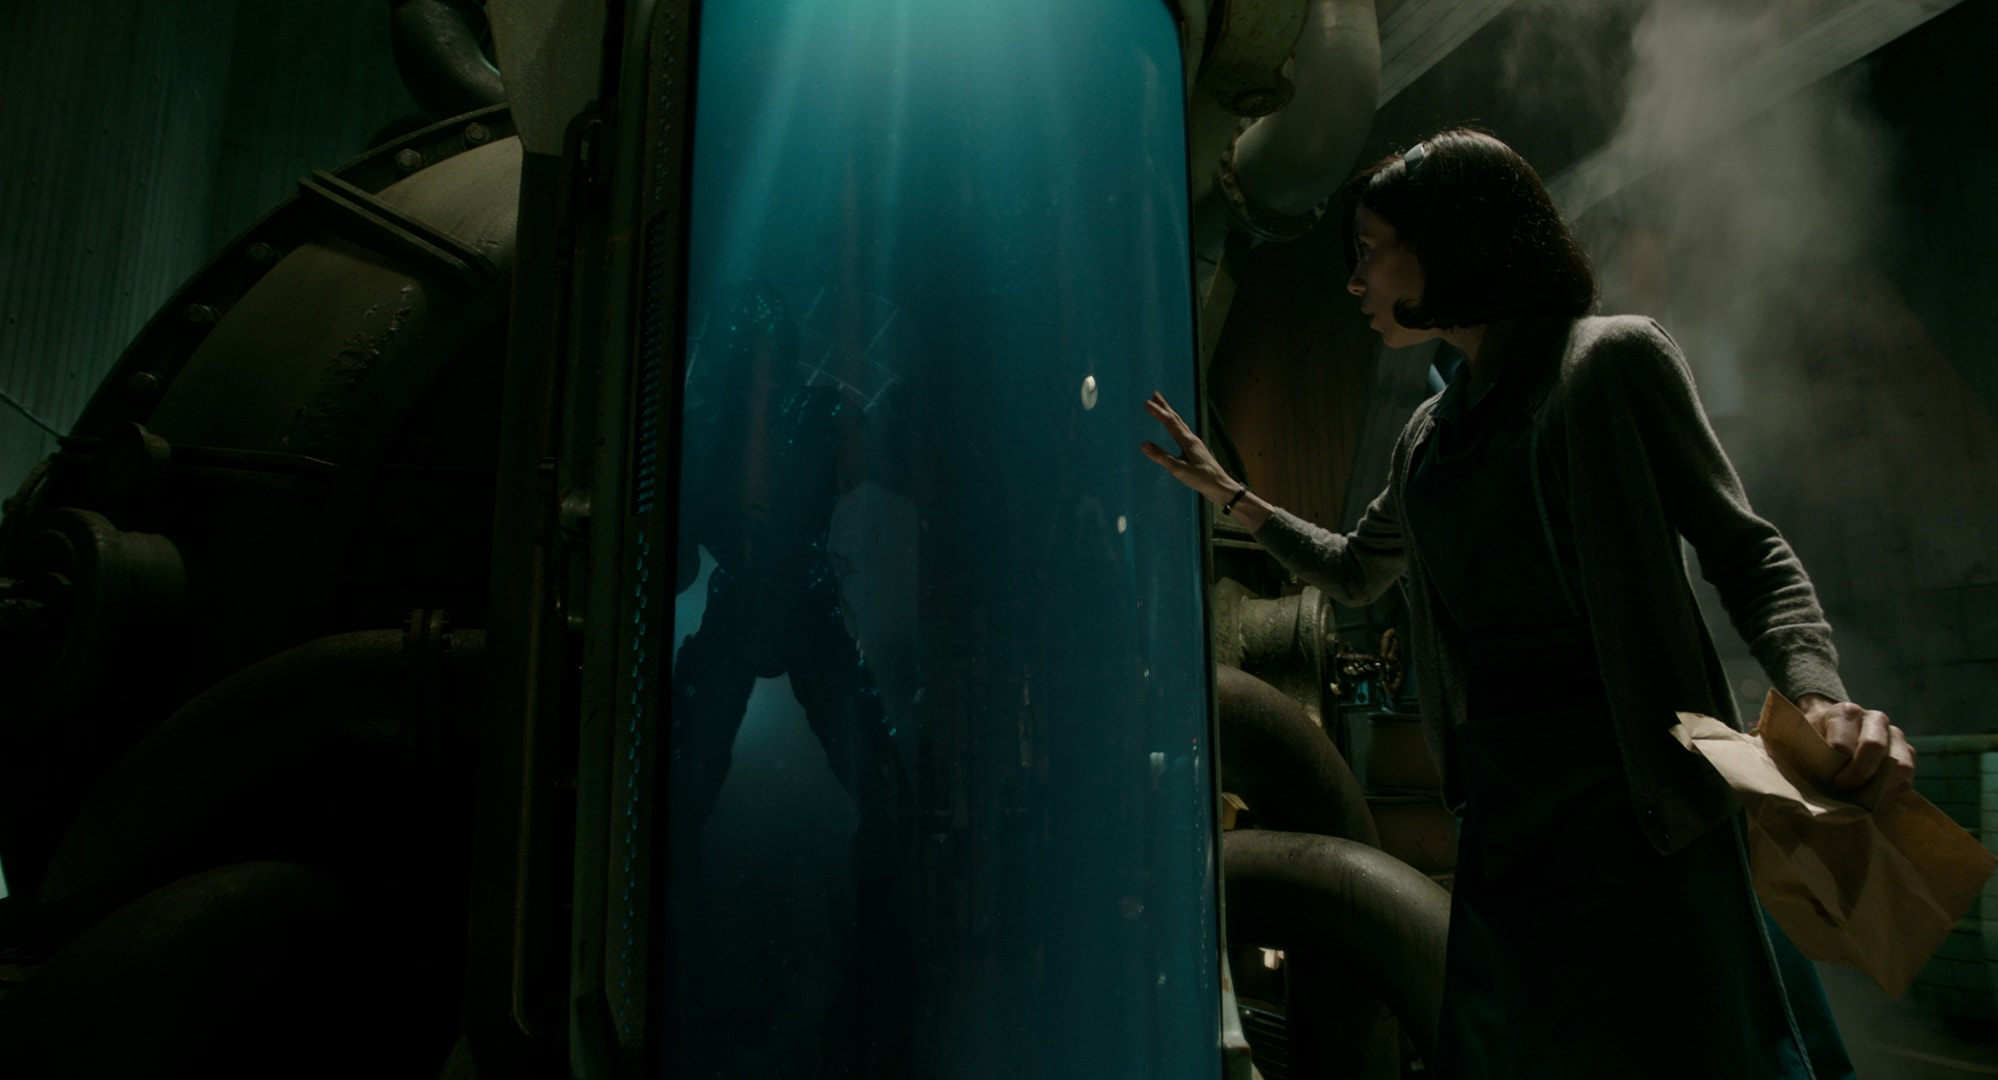 La Forme de l'eau Guillermo del Toro image film